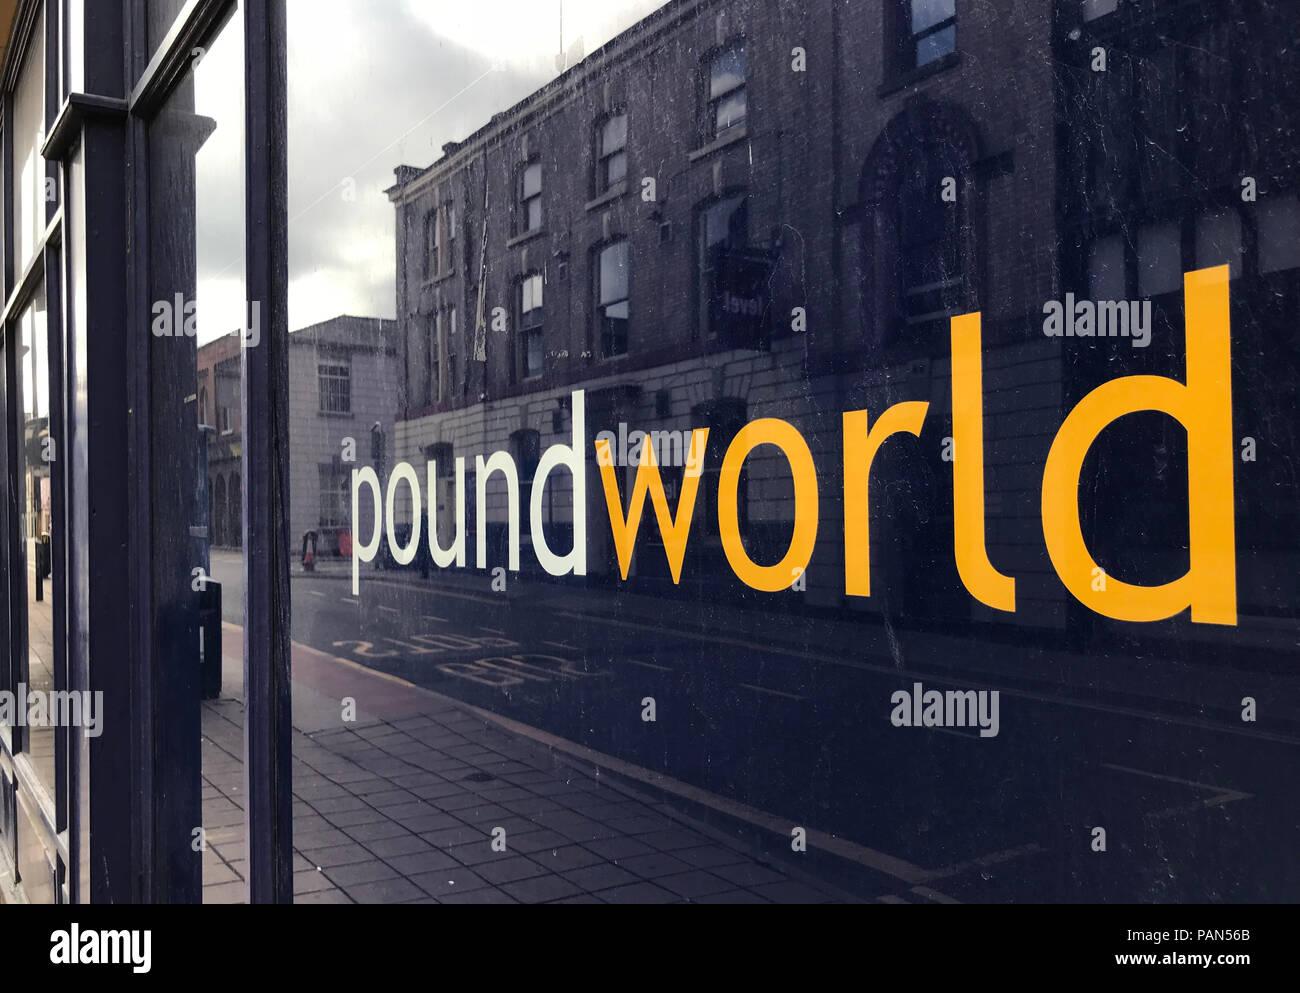 @HotpixUK,GoTonySmith,retail store,closed,retailer,Bridge Street,Warrington,Cheshire,North West England,UK,Retailer,bankrupt,High street shop,failed,logo,sign,Poundworld goes bust,Brexit,internet effect,Chris Edwards Sr,Chris Edwards Jr,Poundland,Everything a pound,everything a £1,Poundworld shop window,Poundworld shop logo,Poundworld shop window logo